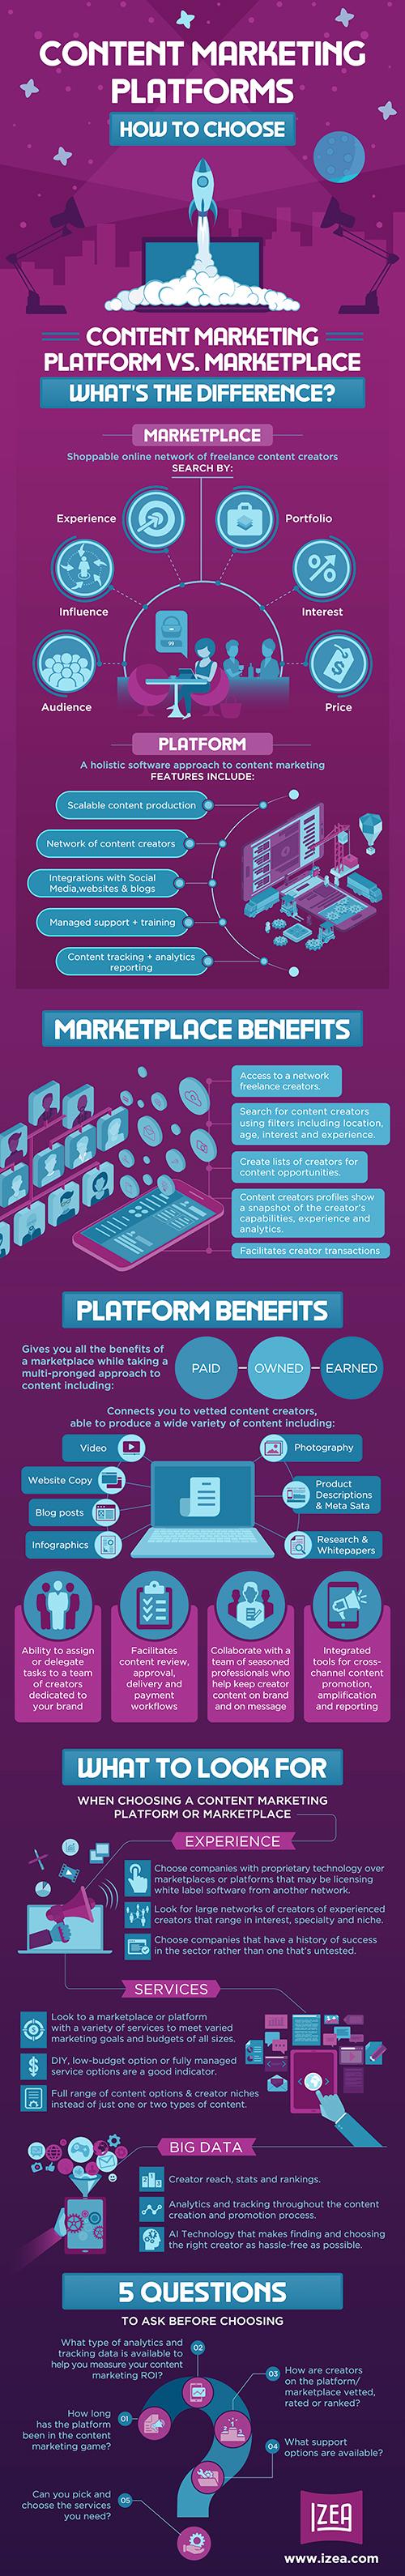 Infographic Content Marketing Platform WEB 1